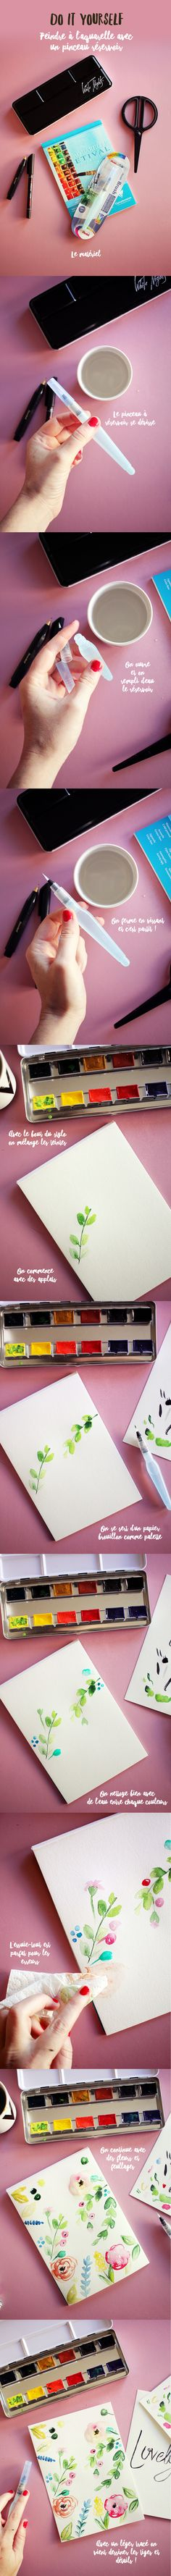 diy_peinture_aquarelle_pinceau_reservoir